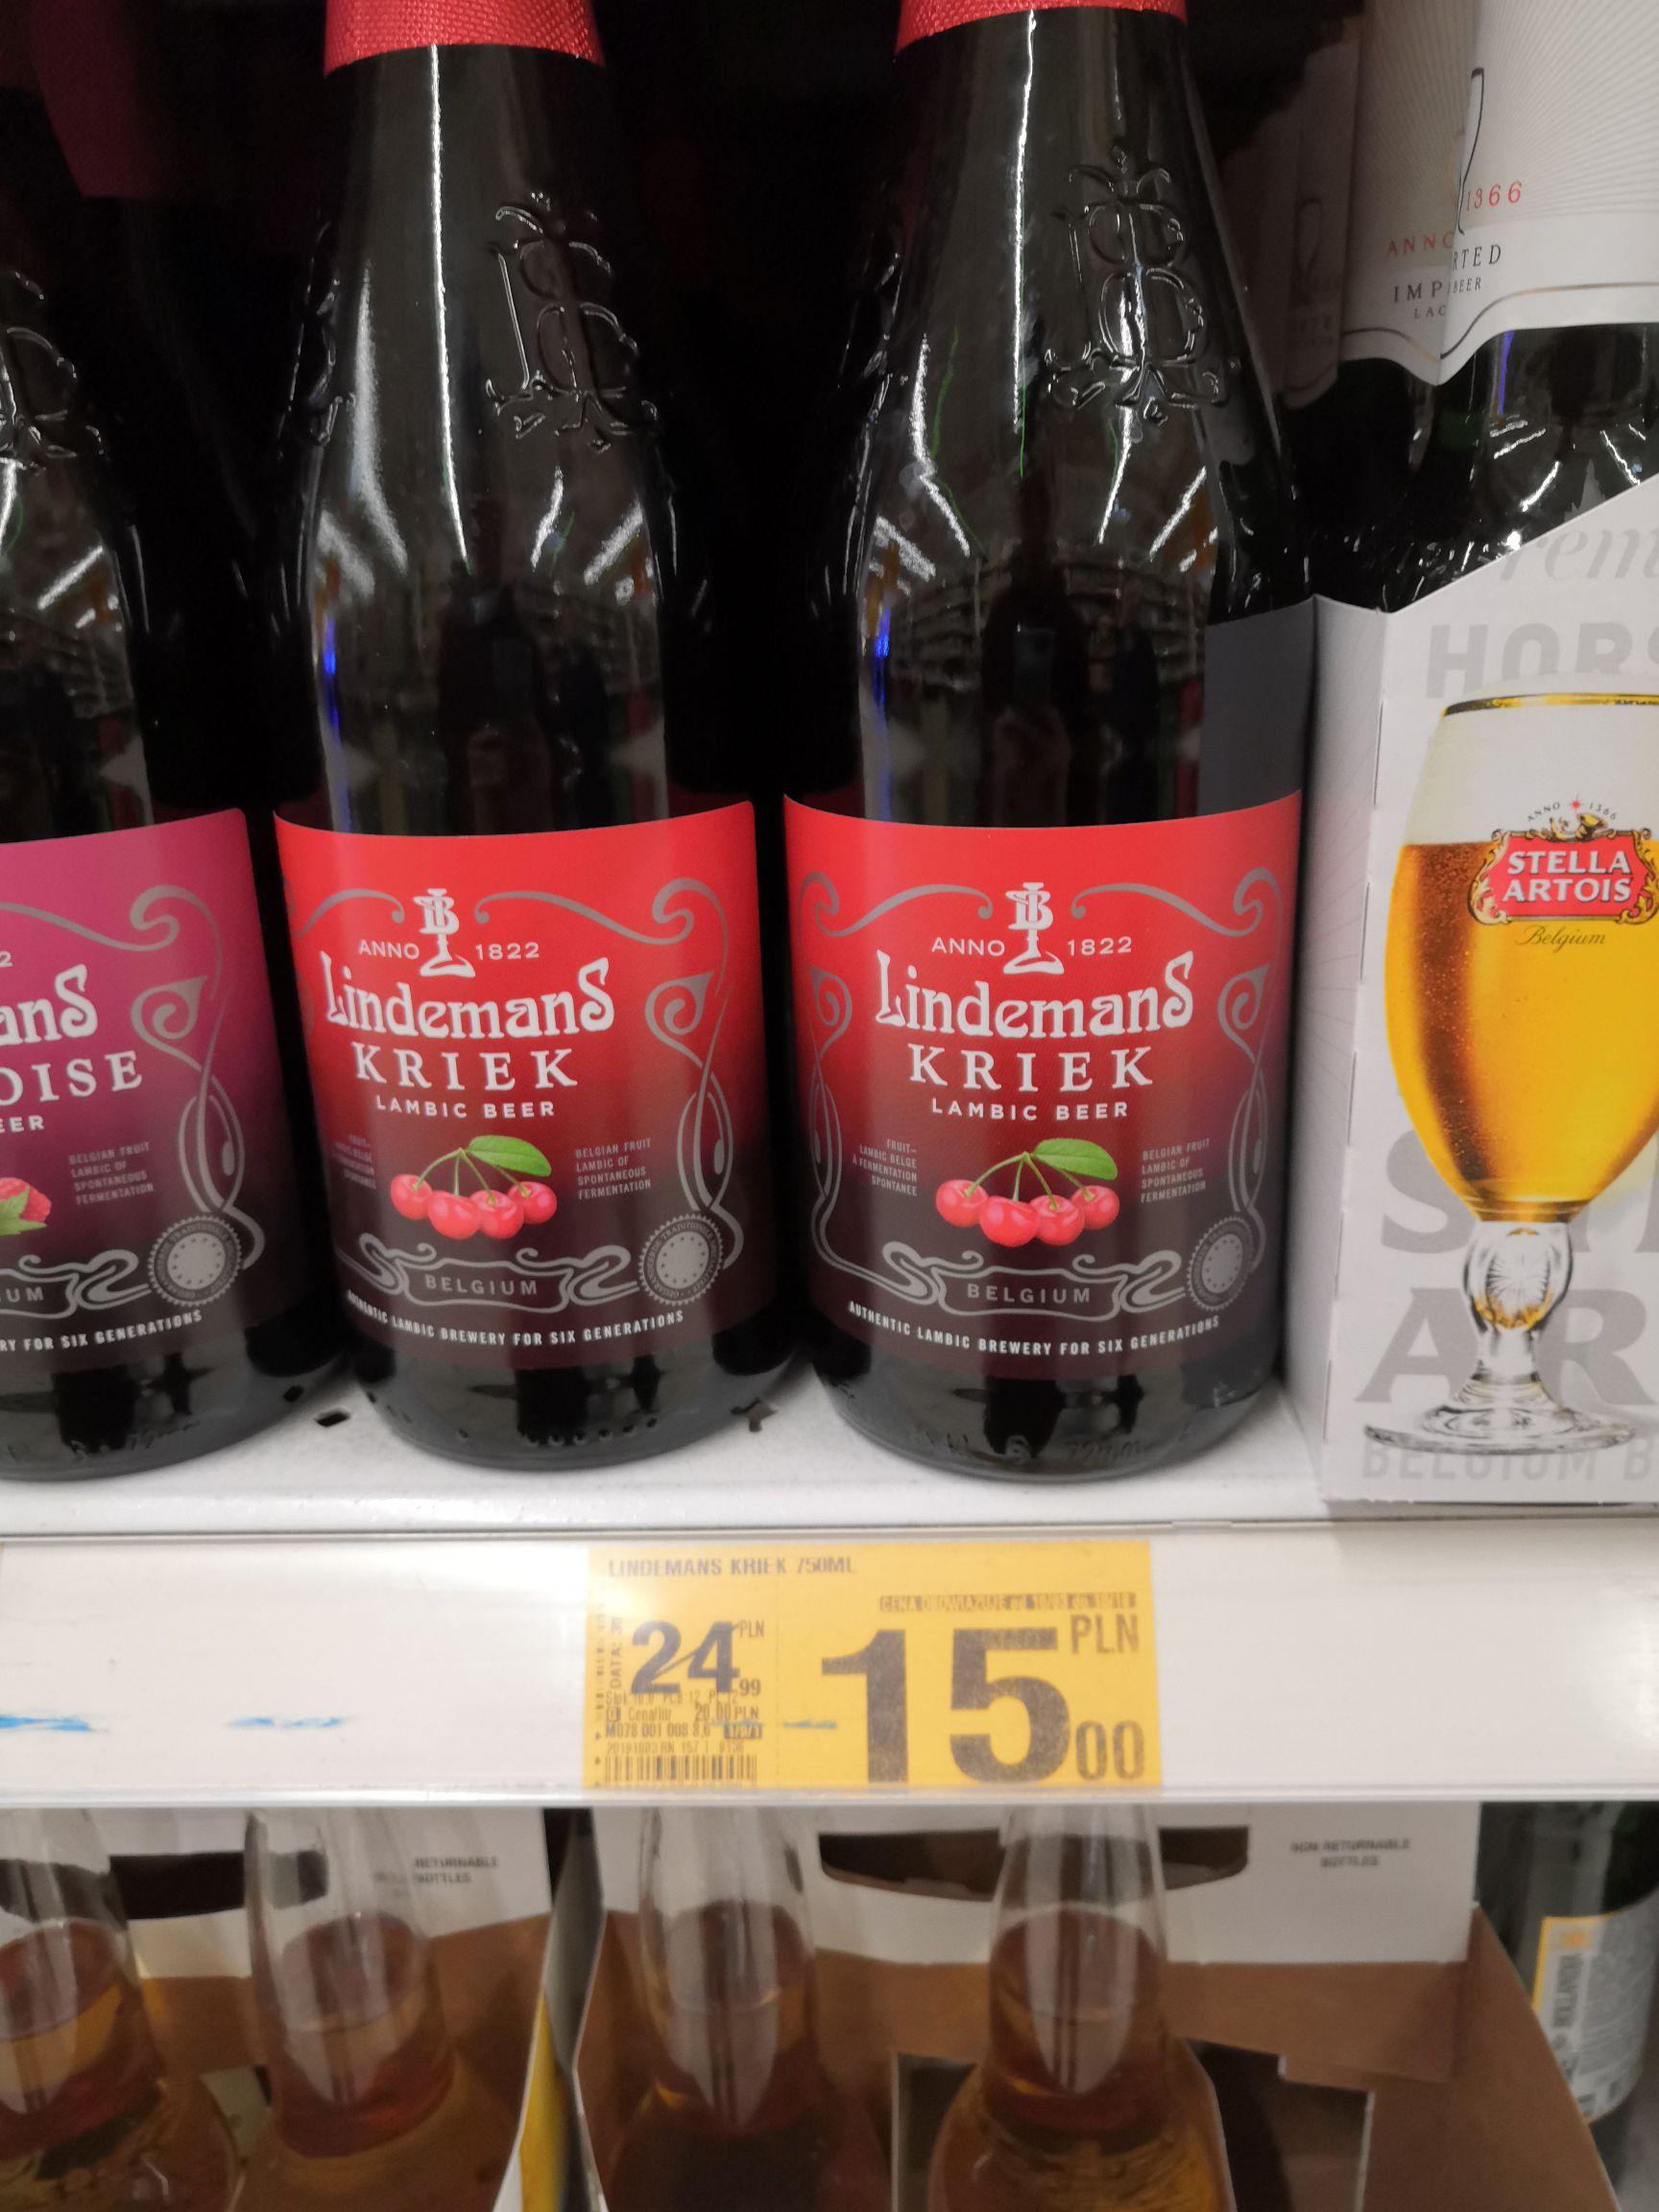 Piwo Lindemans Kriek 750ml Auchan Poczesna